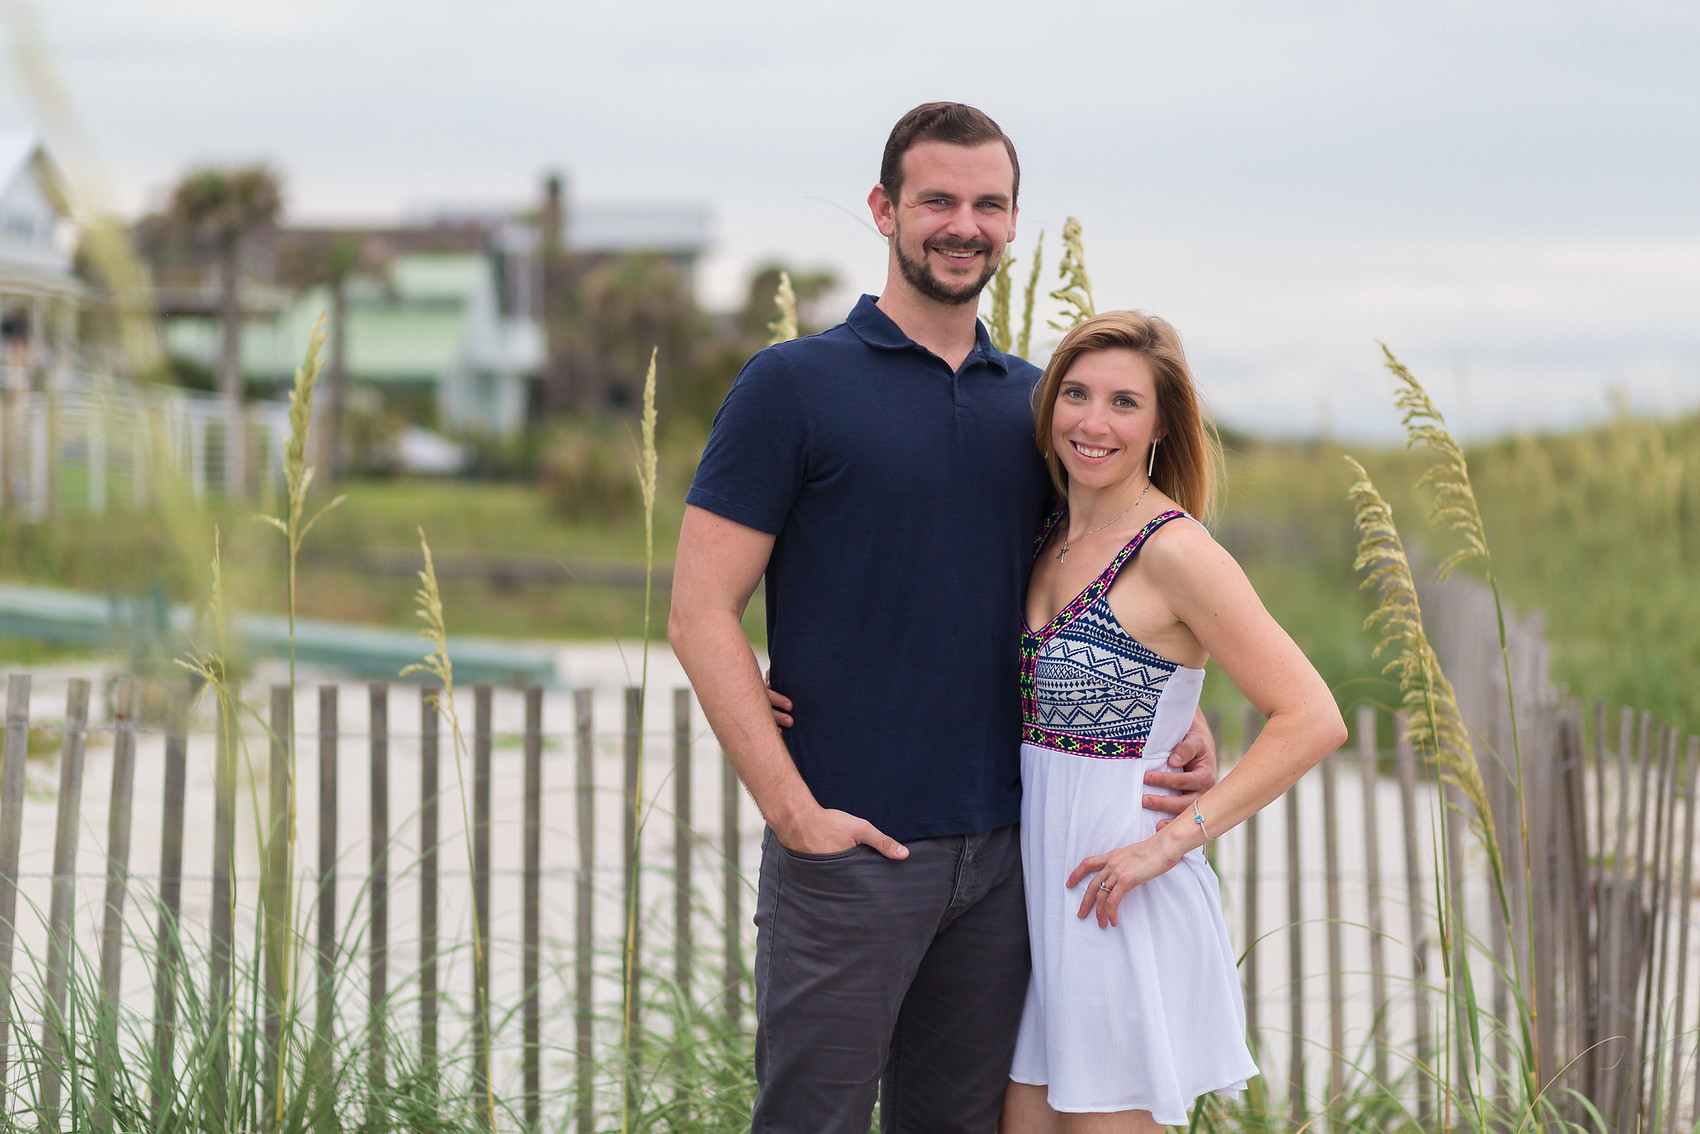 adam-szarmack-jacksonville-wedding-photographer-atlantic-beach-engagement-pictures-27.jpg